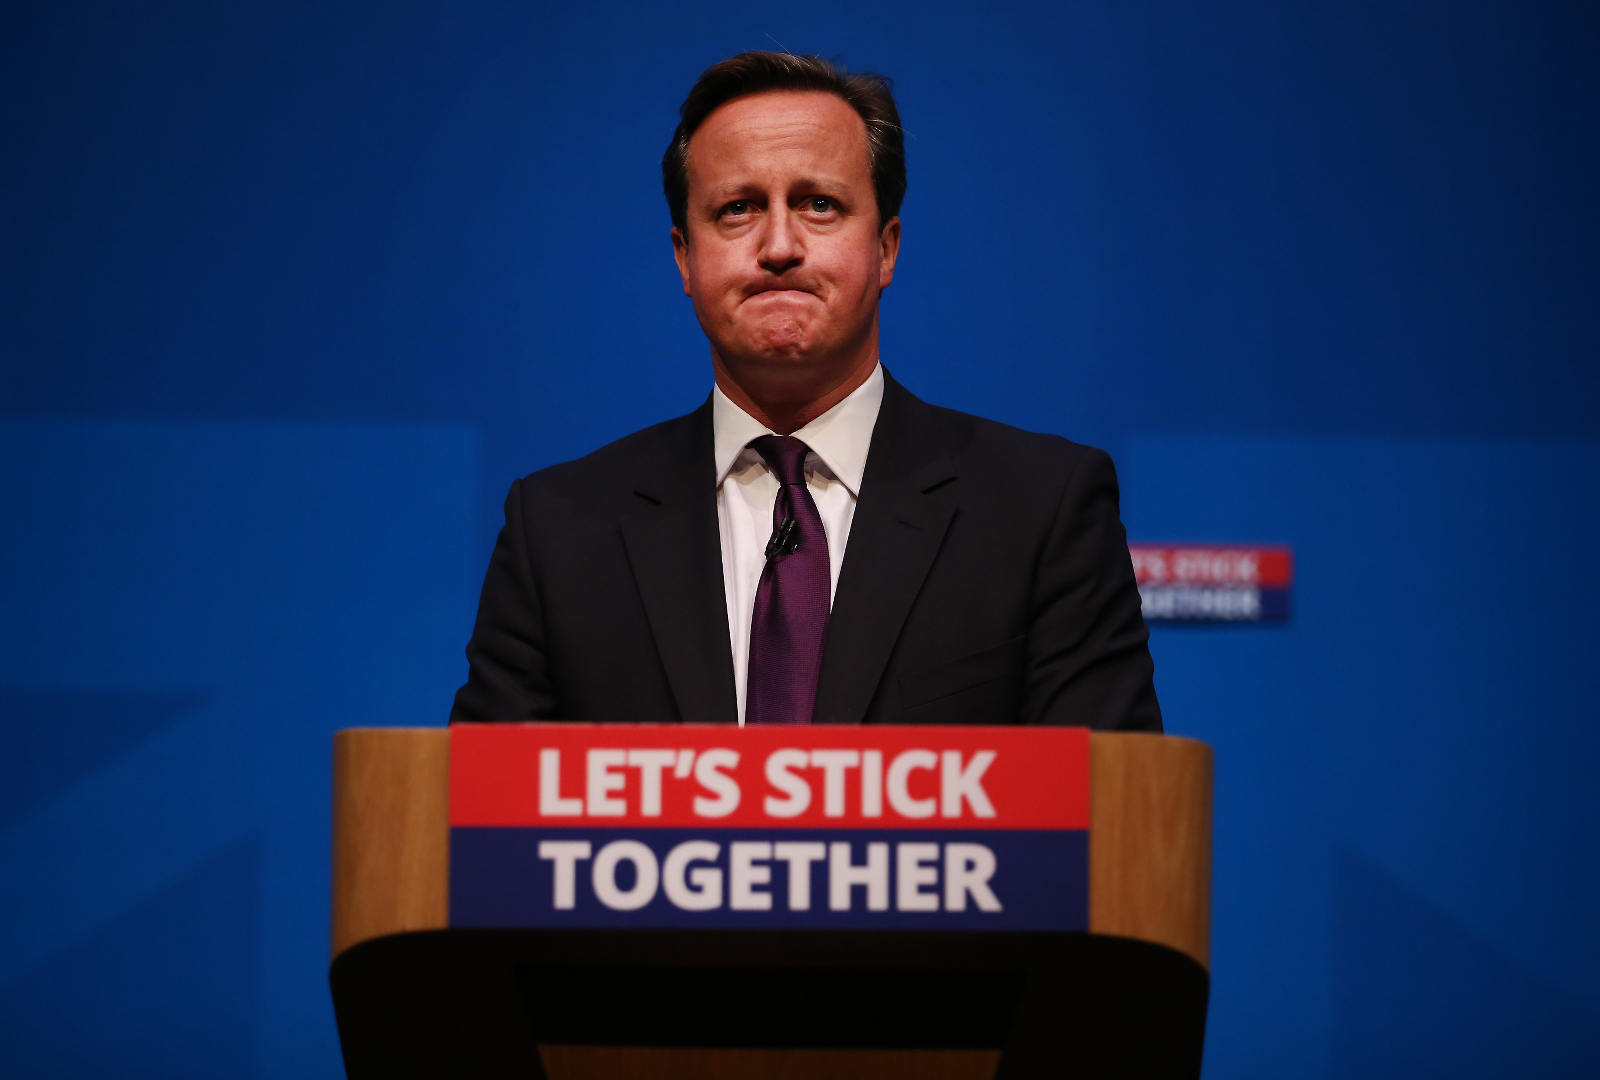 David Cameron Speaking in Edinburgh